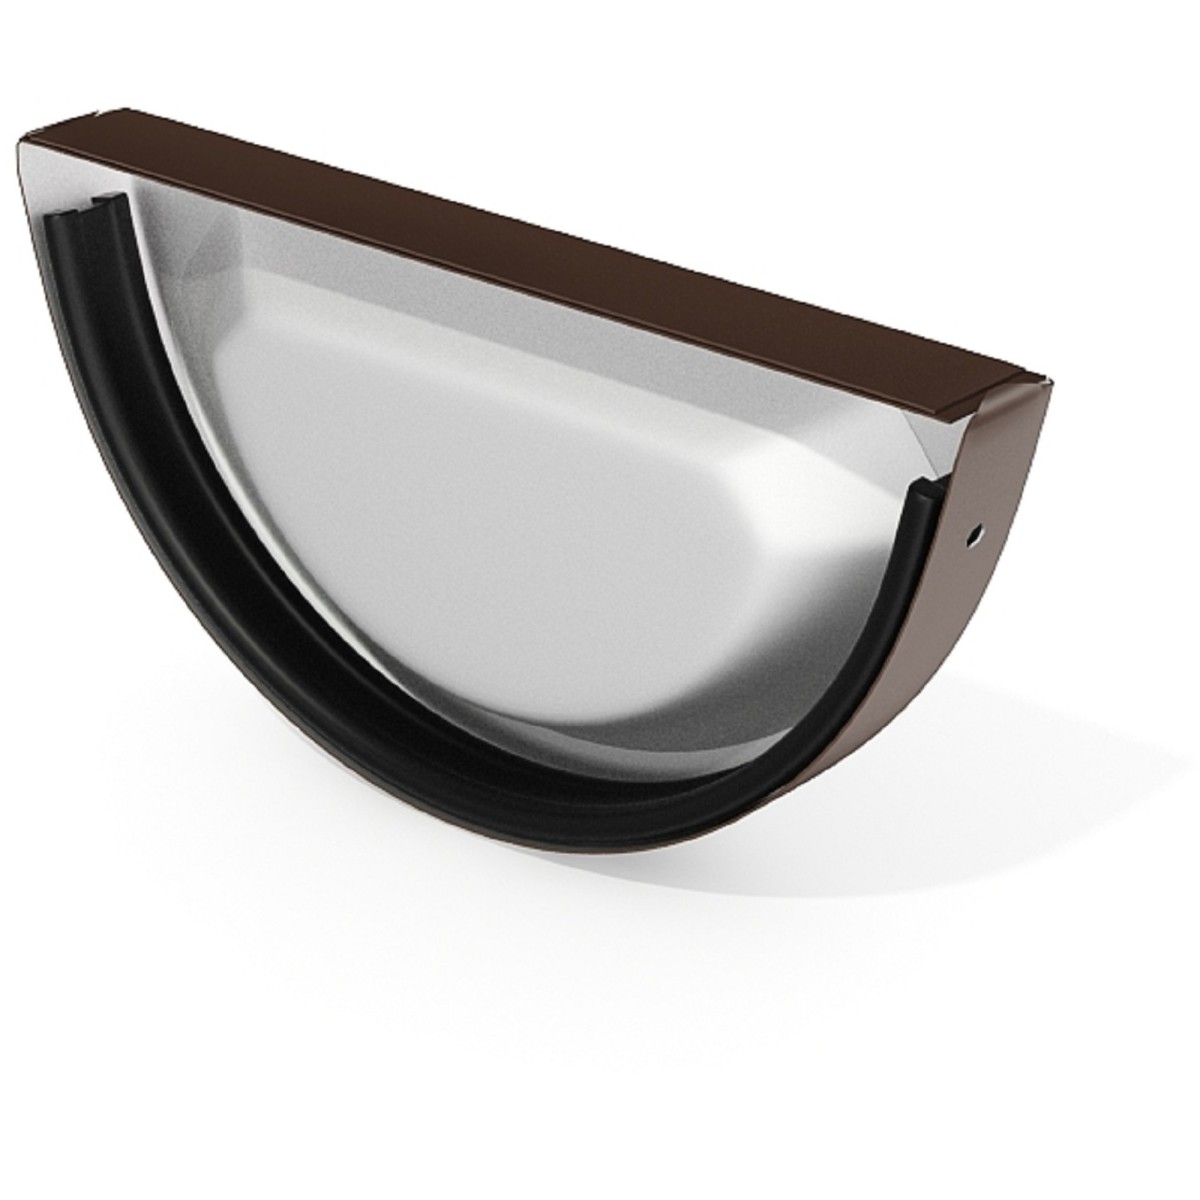 Заглушка желоба 125 мм цвет коричневый